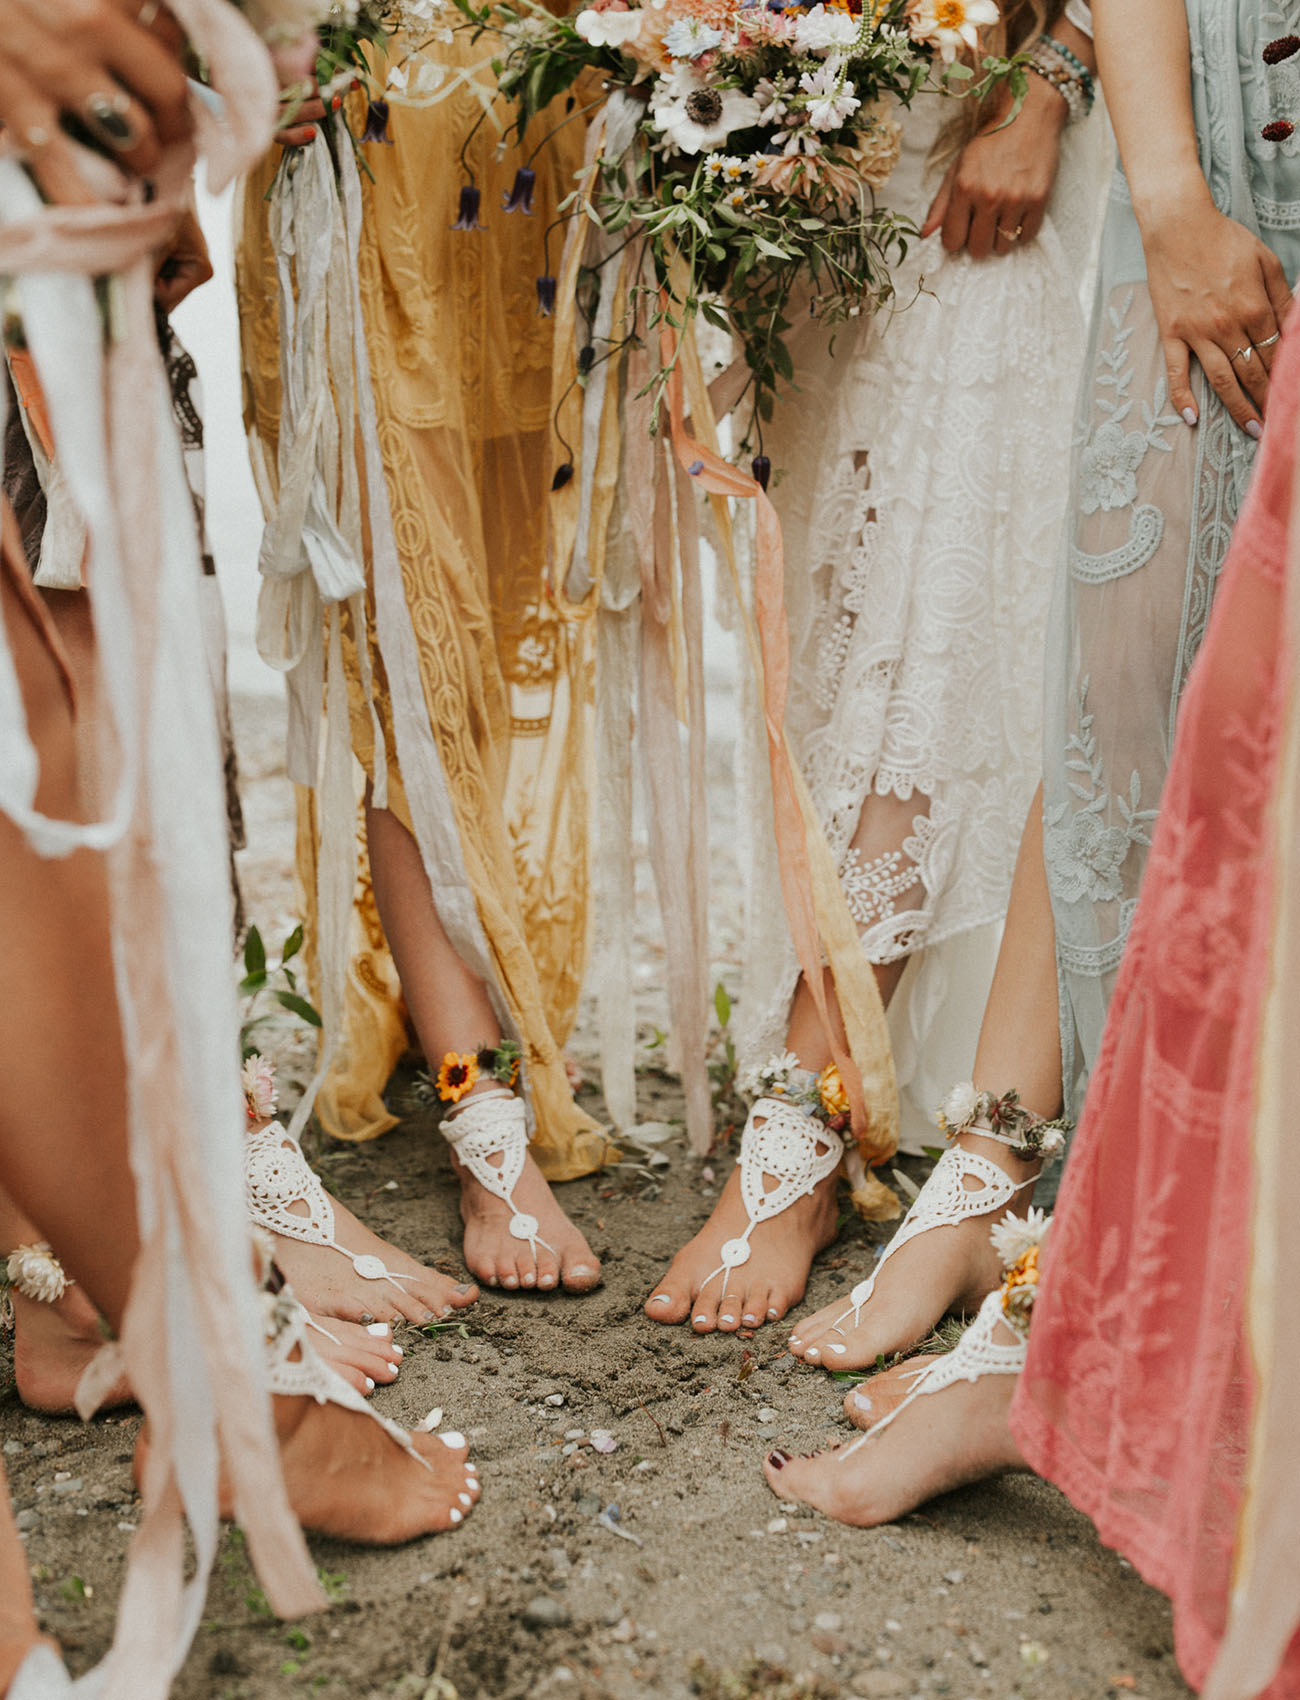 macrame feet jewelry